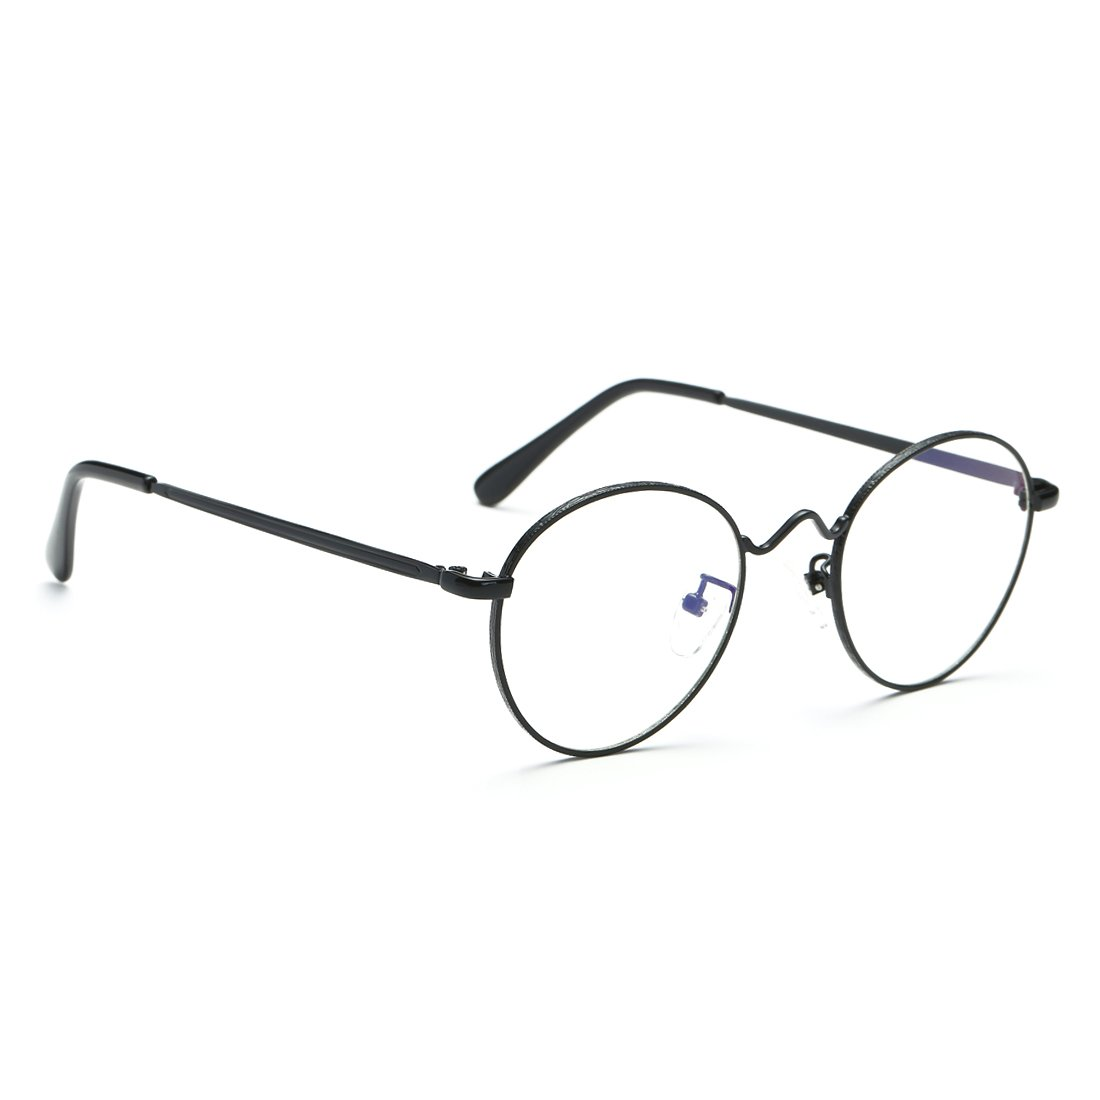 Cyxus Clear Lens Plain Glasses, Vintage Retro Fashion Eyewaer for Men Women, Unisex Spectaclesn Eyeglasses Frame Cyxus Technology Group Ltd. CYGS0152